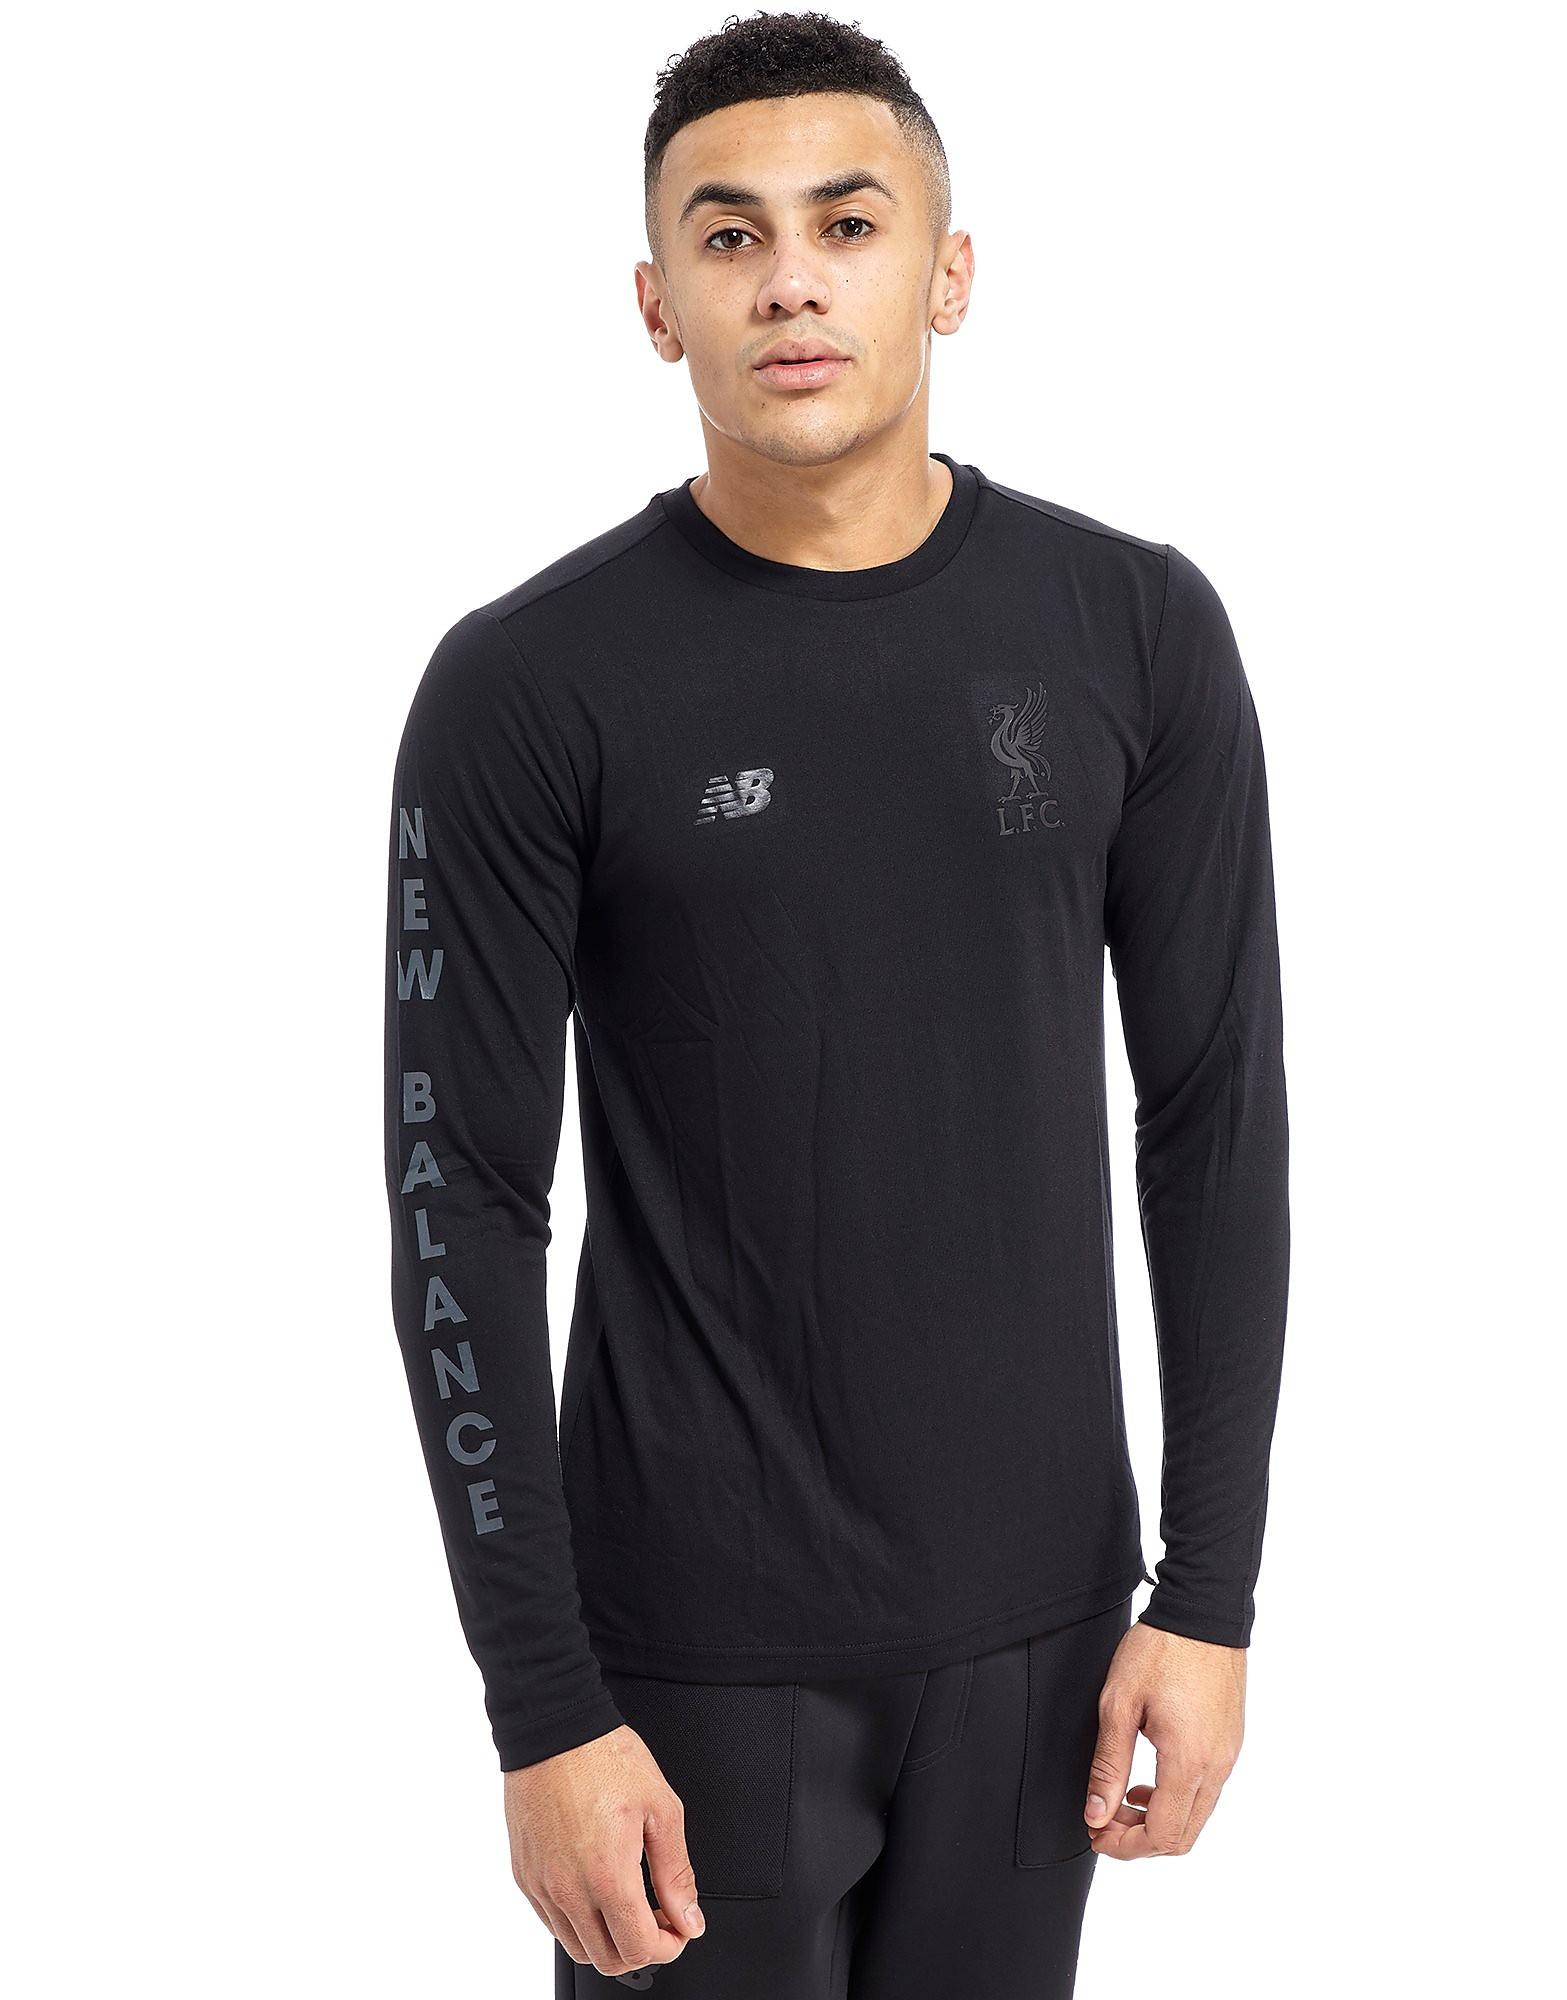 New Balance 247 Liverpool FC T-Shirt a Manica Lunga